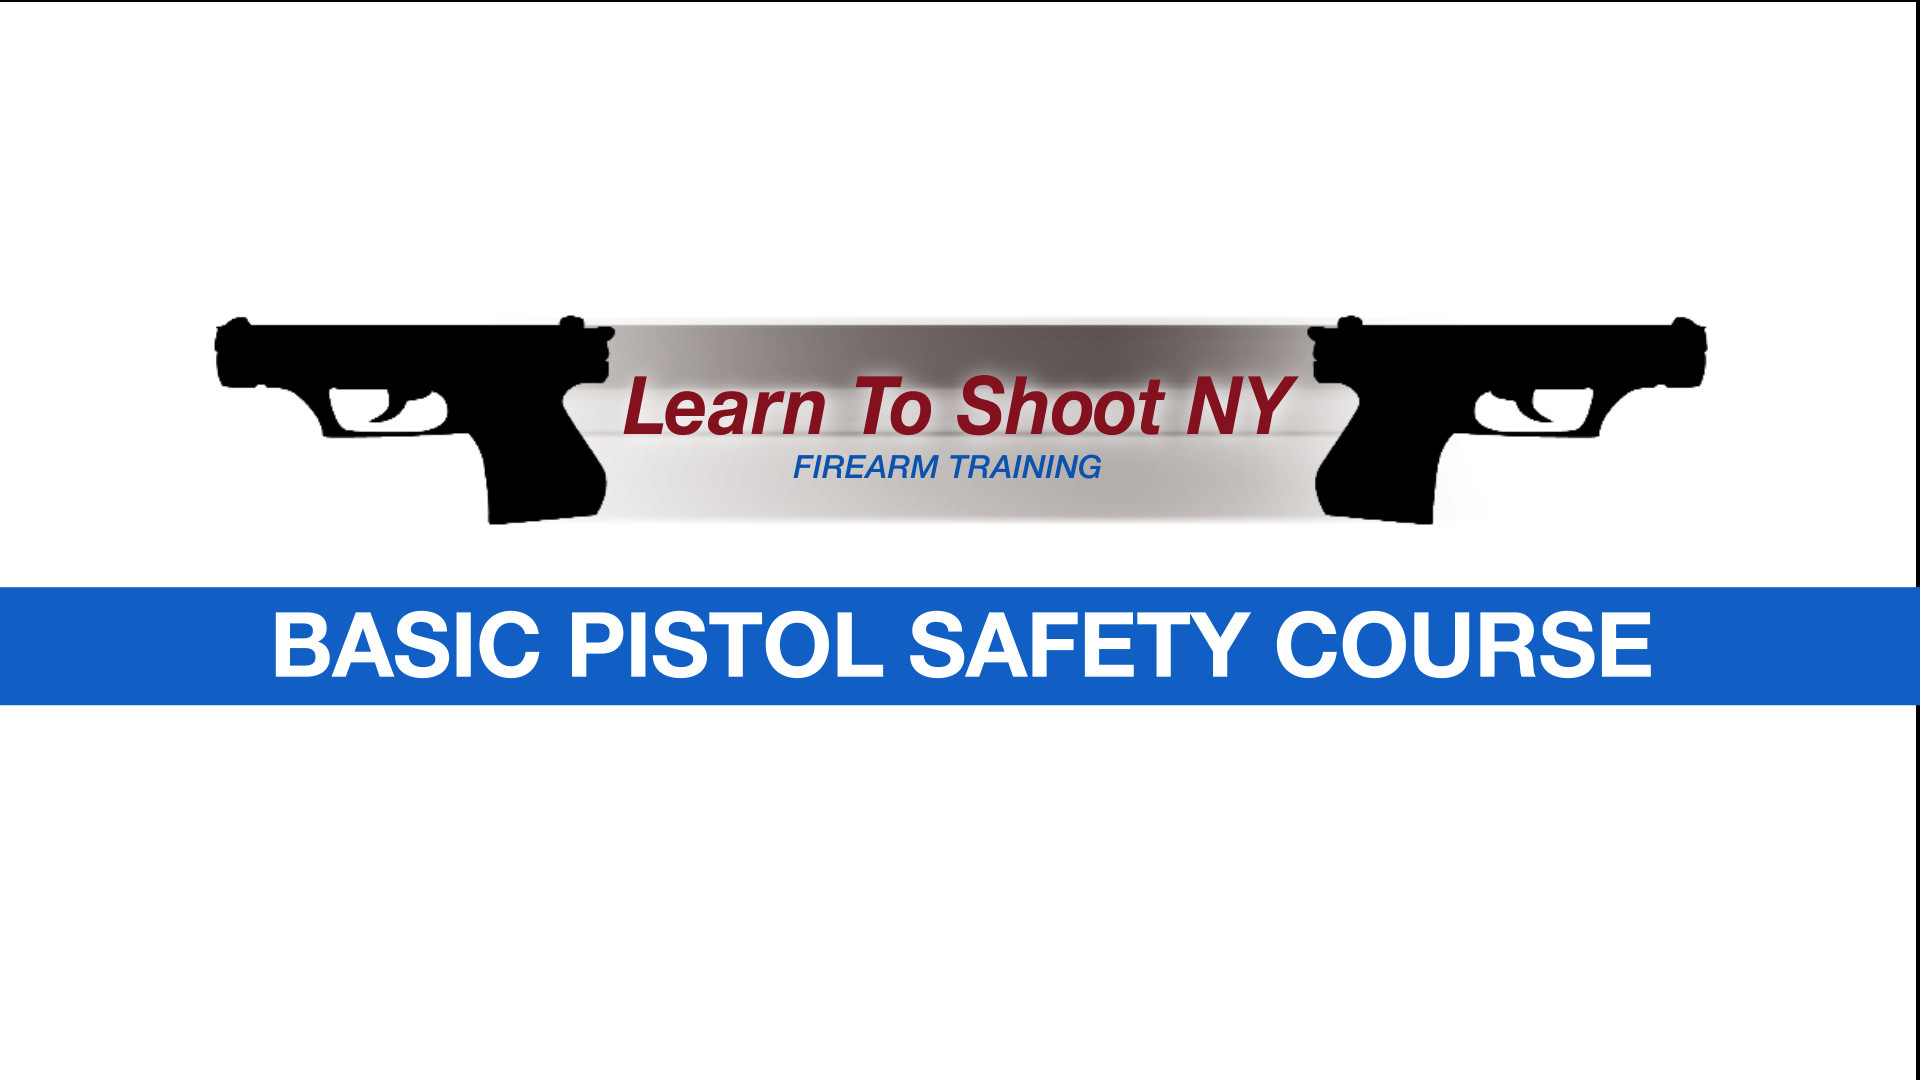 Basic Pistol Safety Course